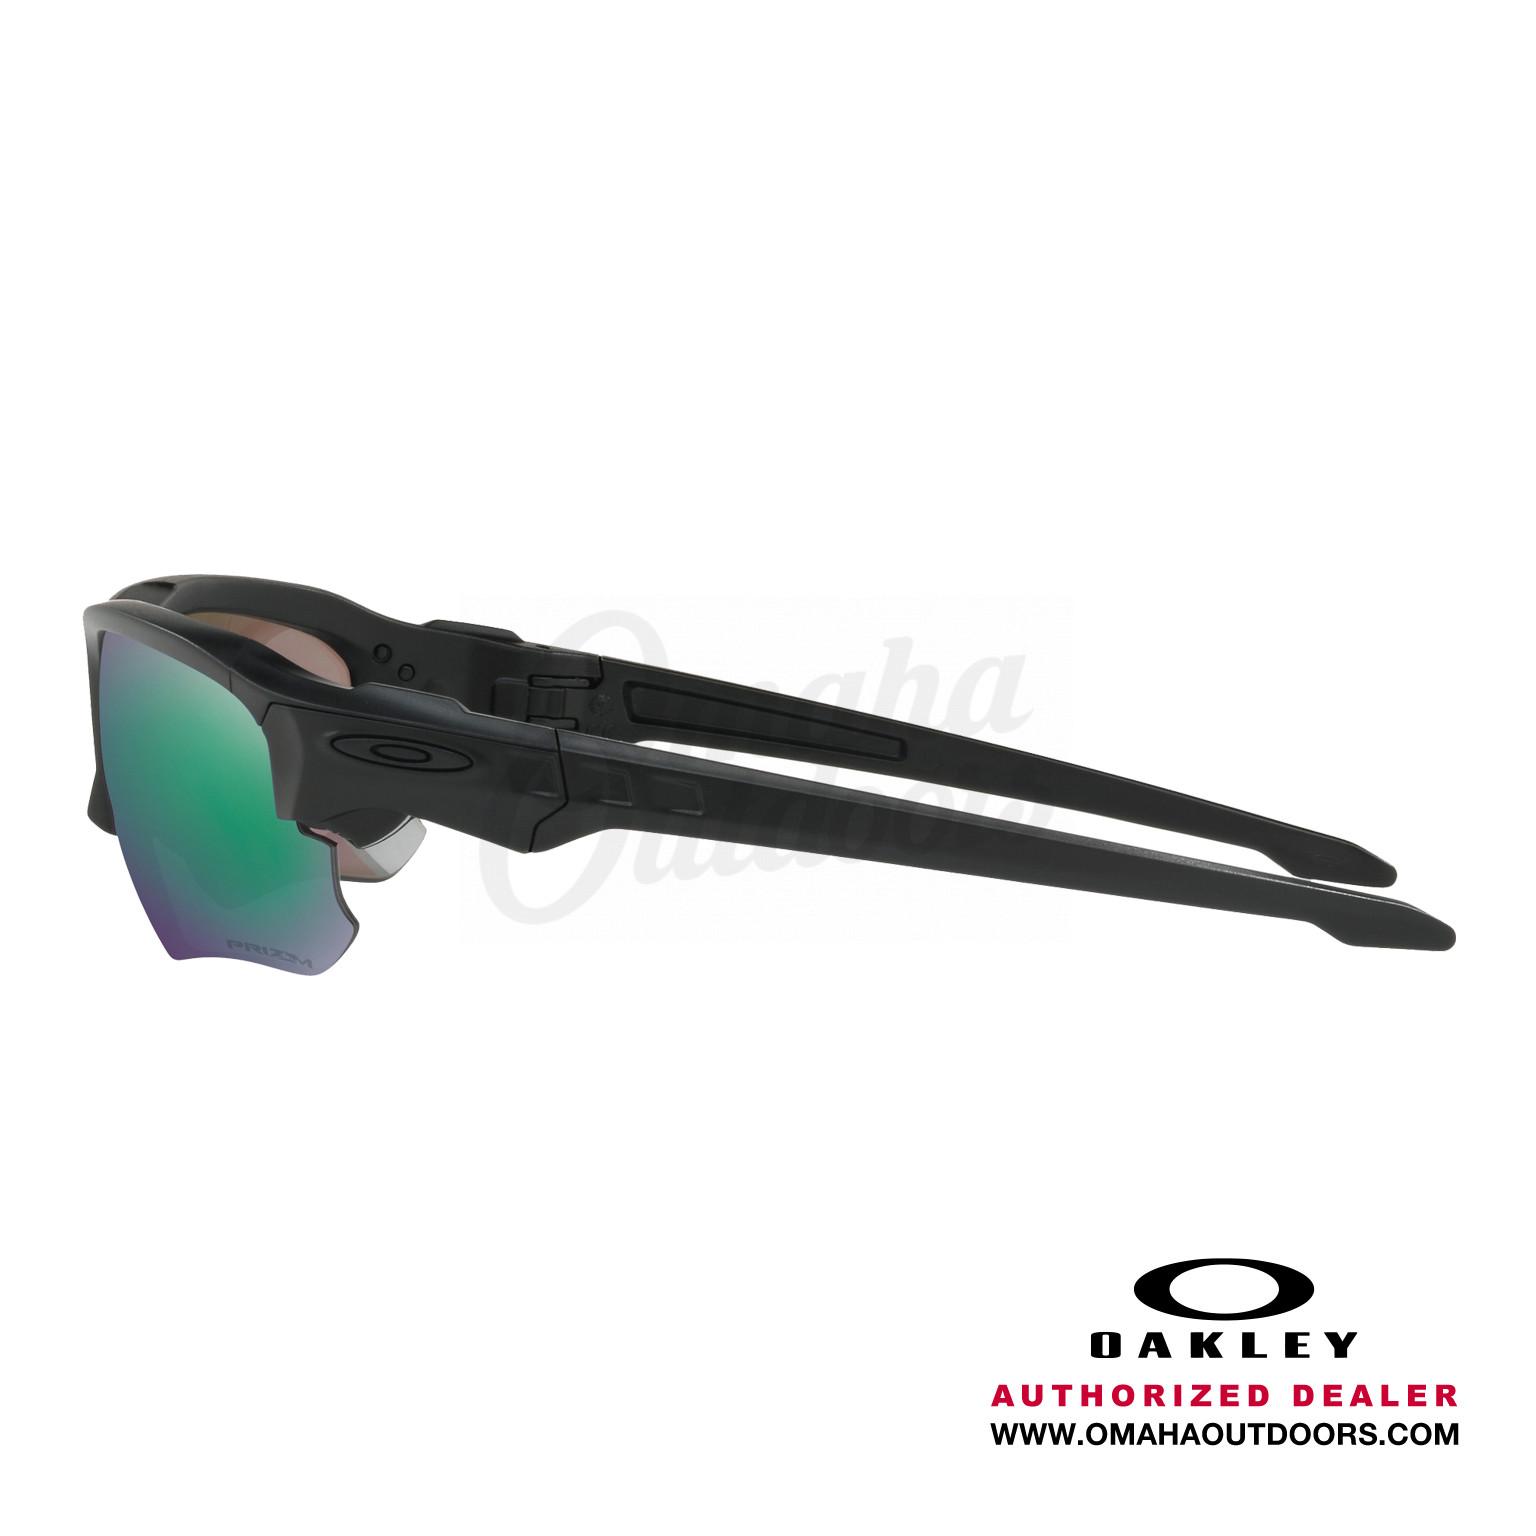 6c40fa82a2 Oakley SI Speed Jacket Safety Eyeglasses Prizm Maritime Polarized Lens ·  OO9228-07